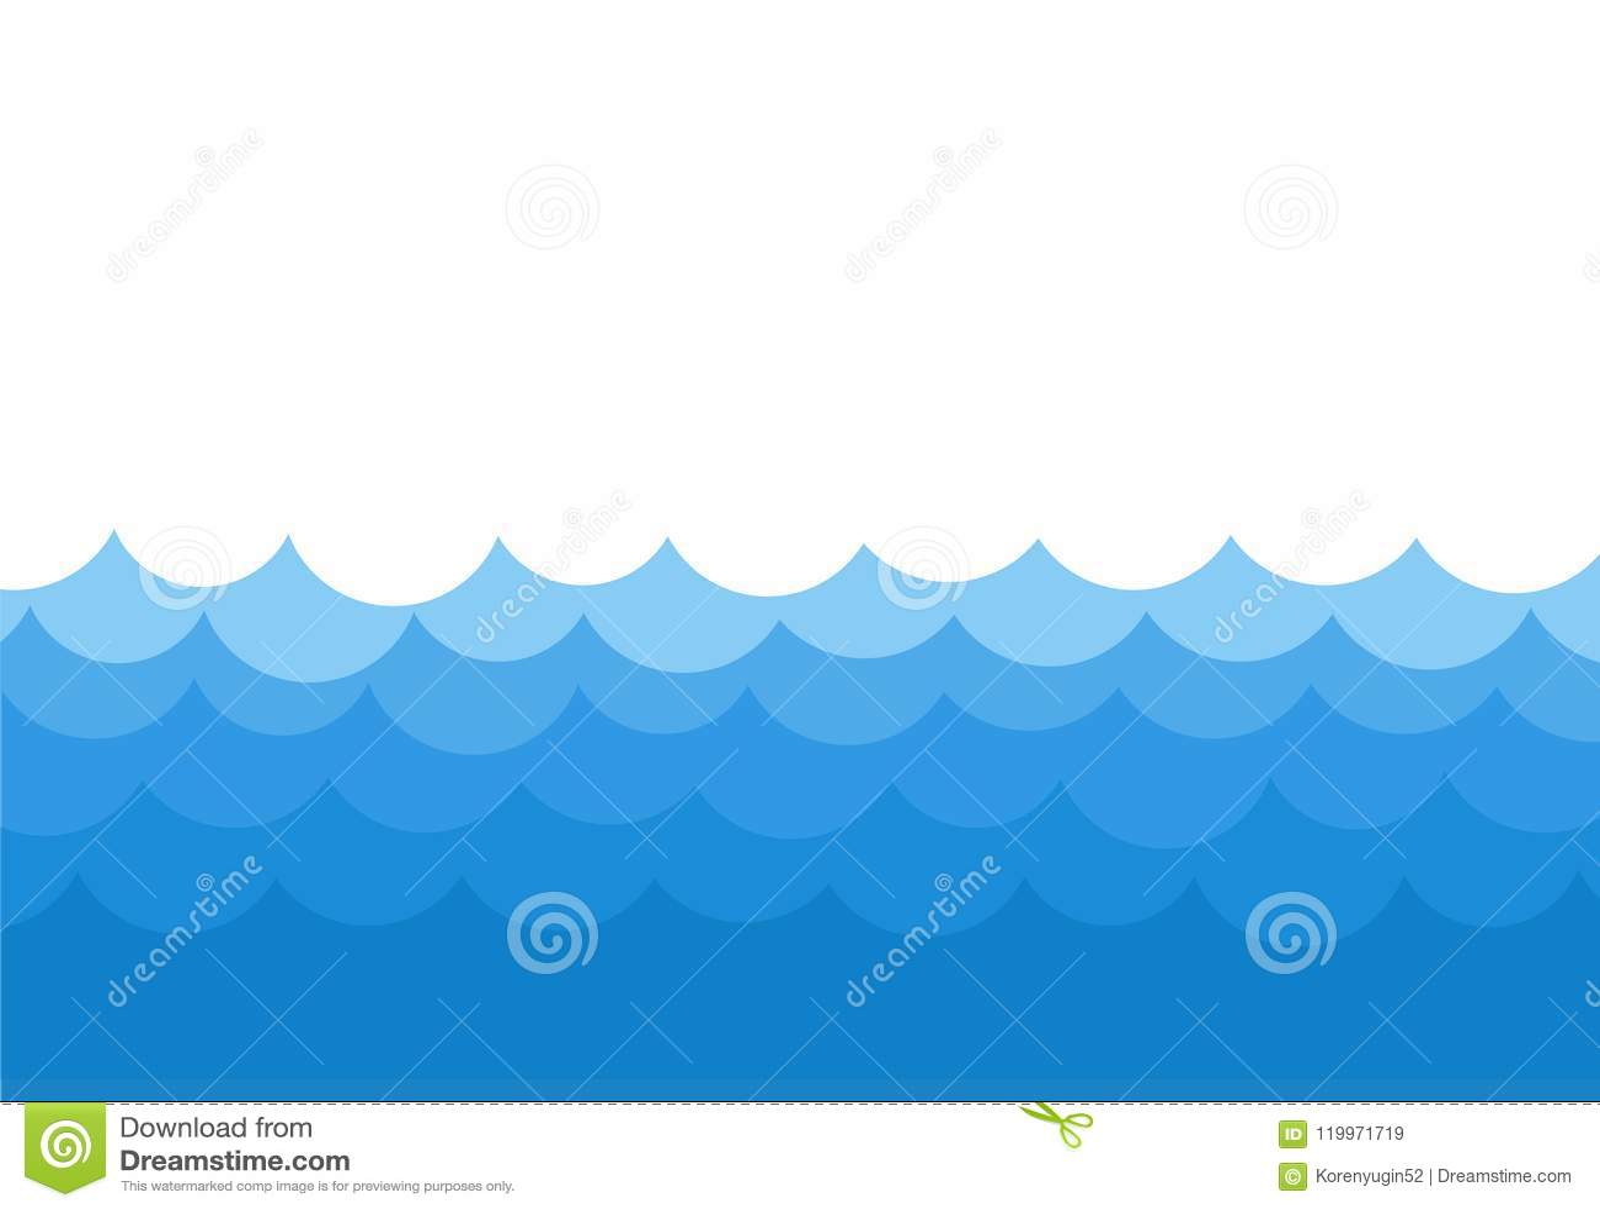 ocean waves template background vector stock illustration stock